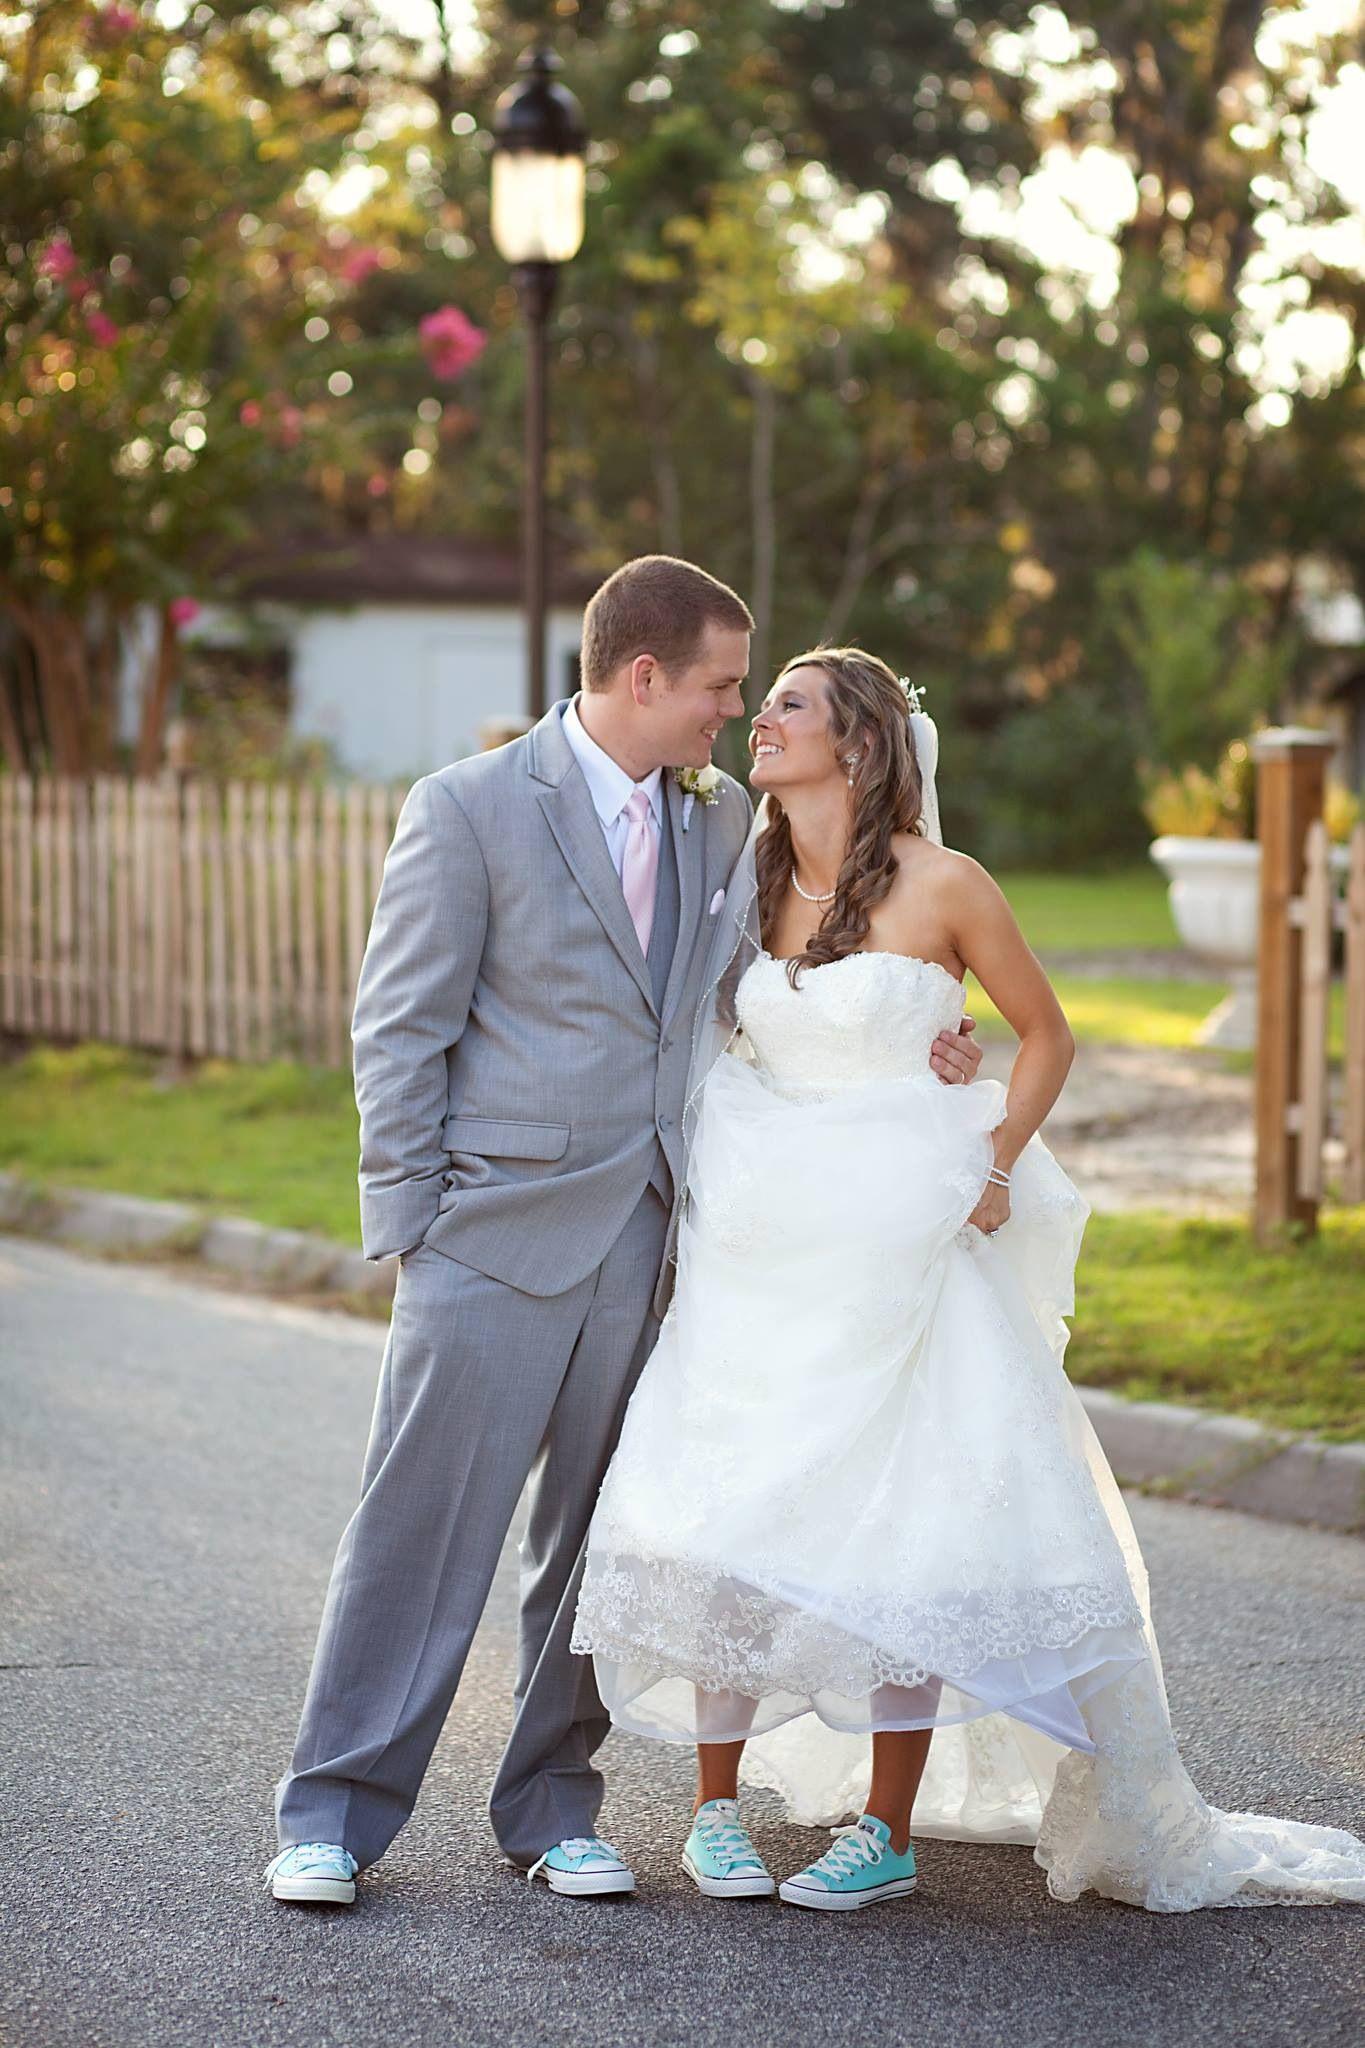 converse blanche femme mariage